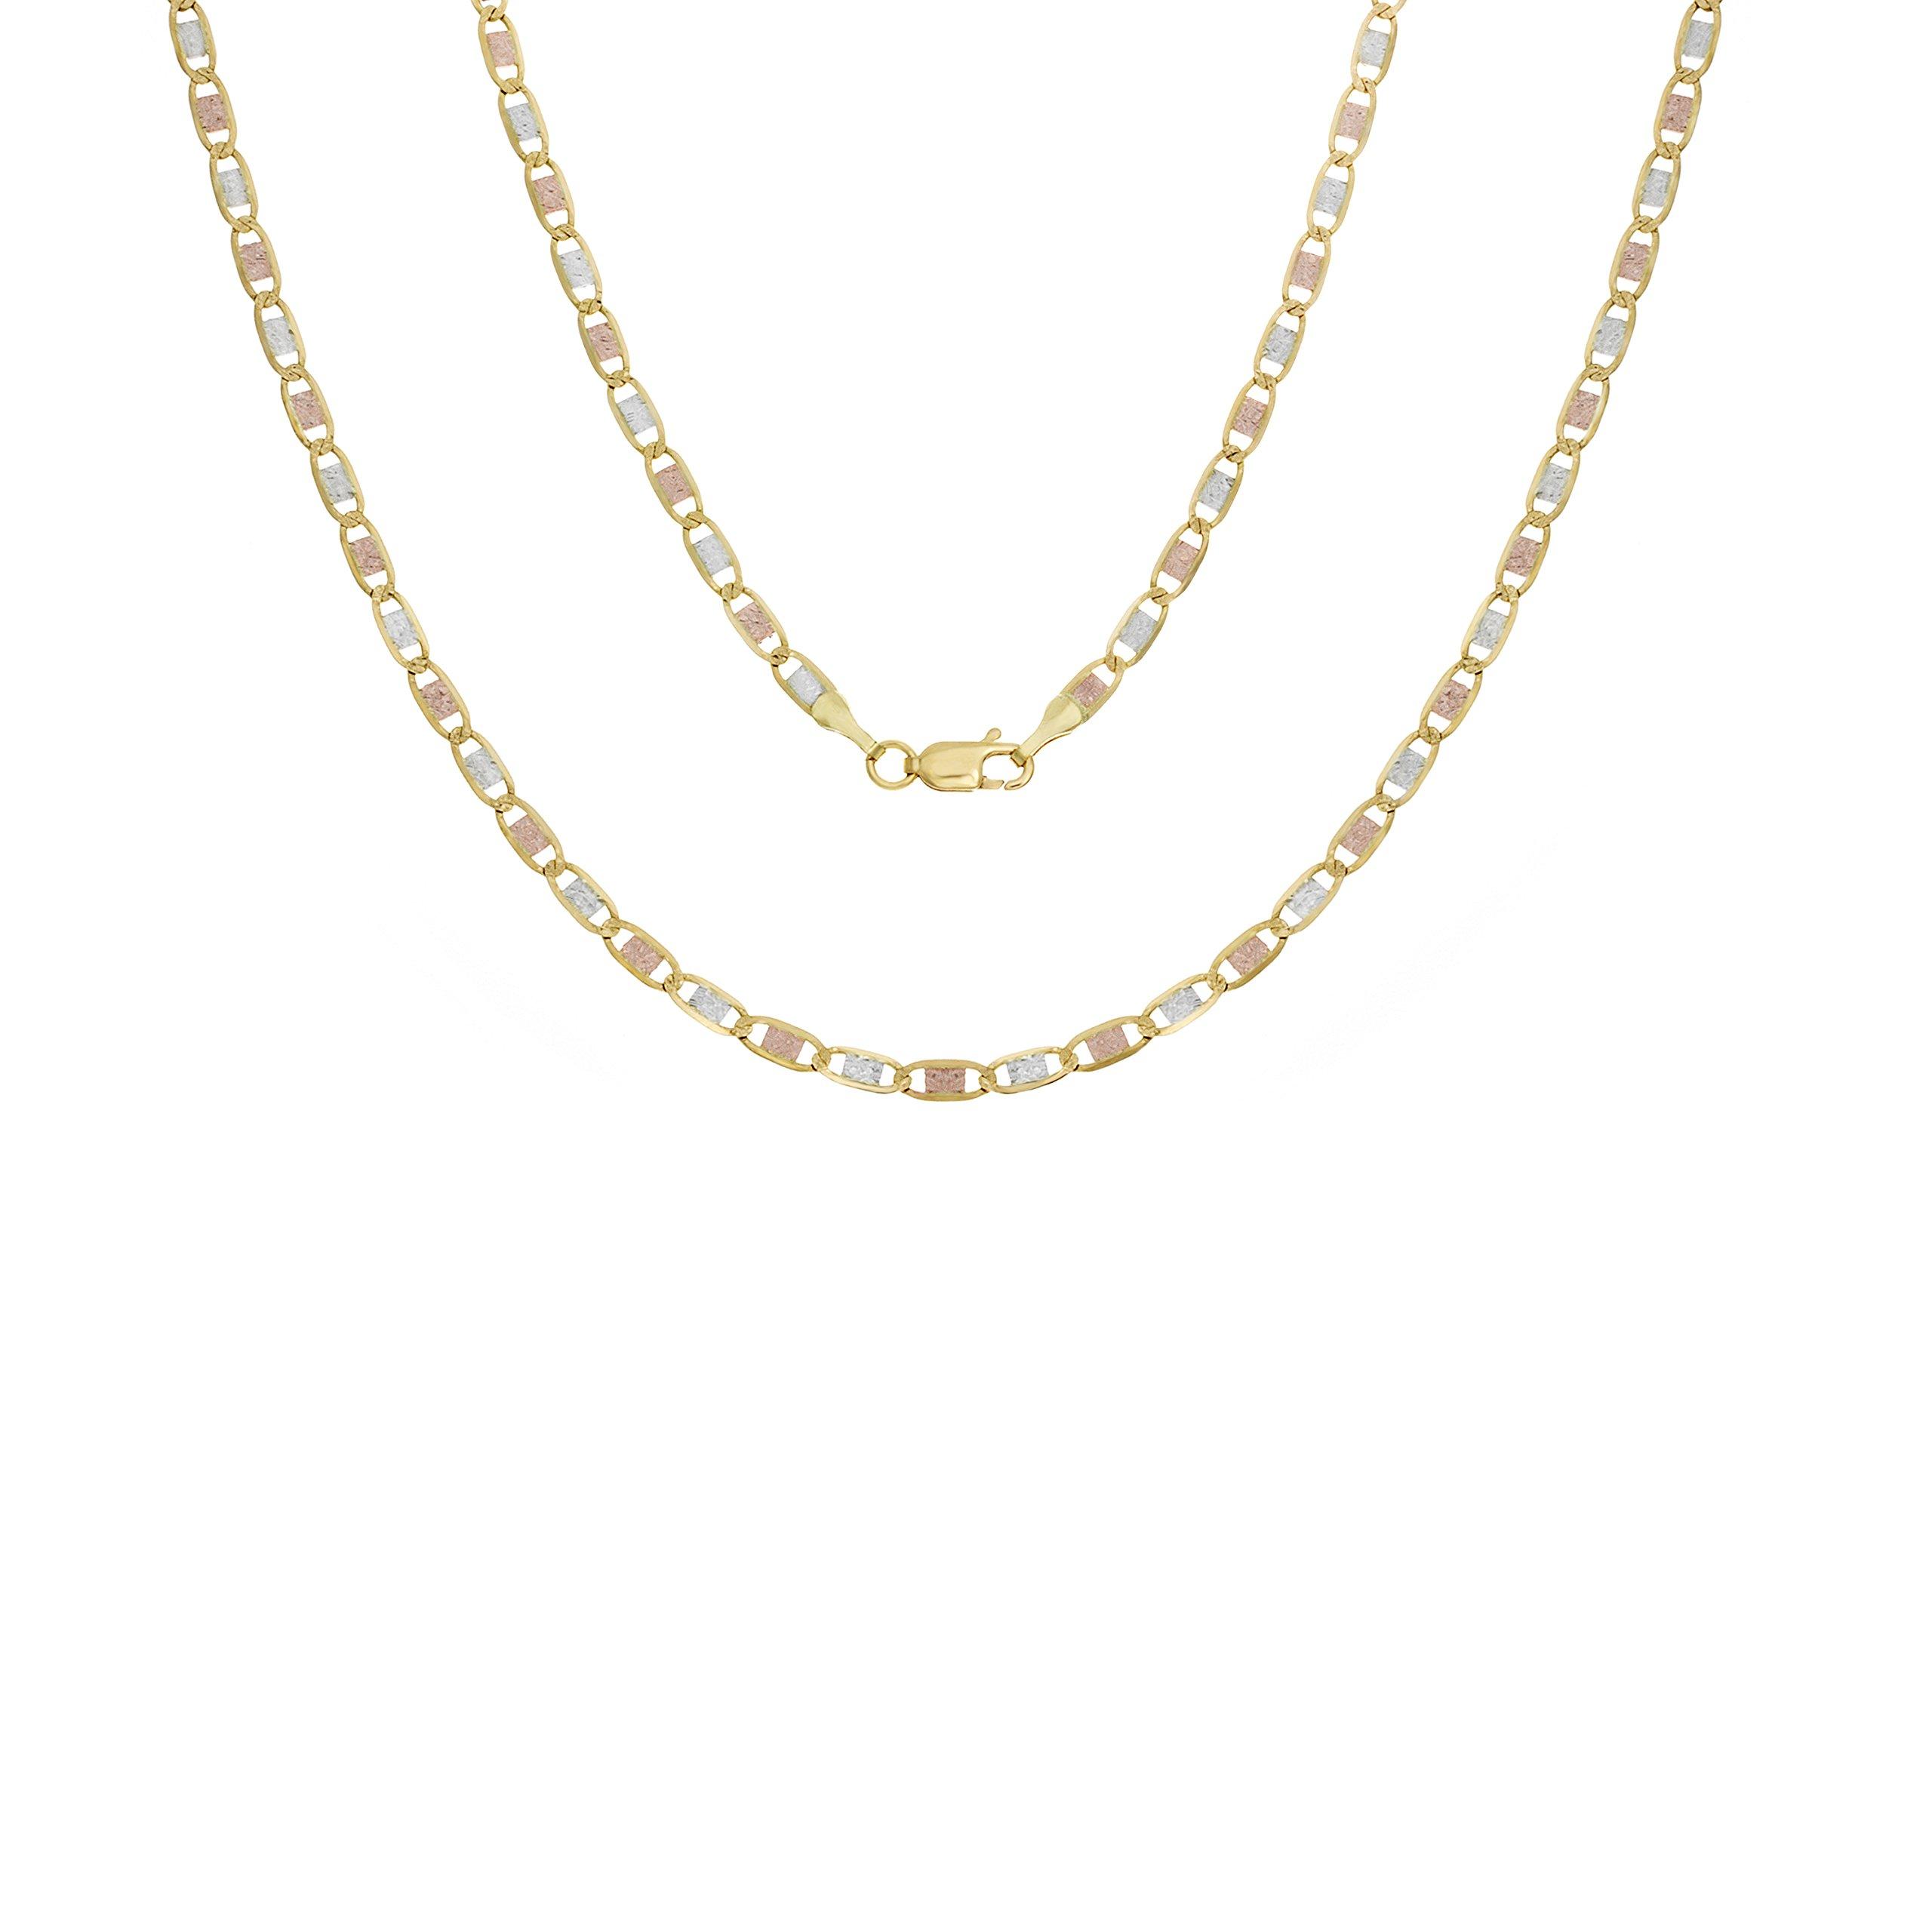 14k Tri-color-gold 2 mm Valentino Link Chain, 20 Inch